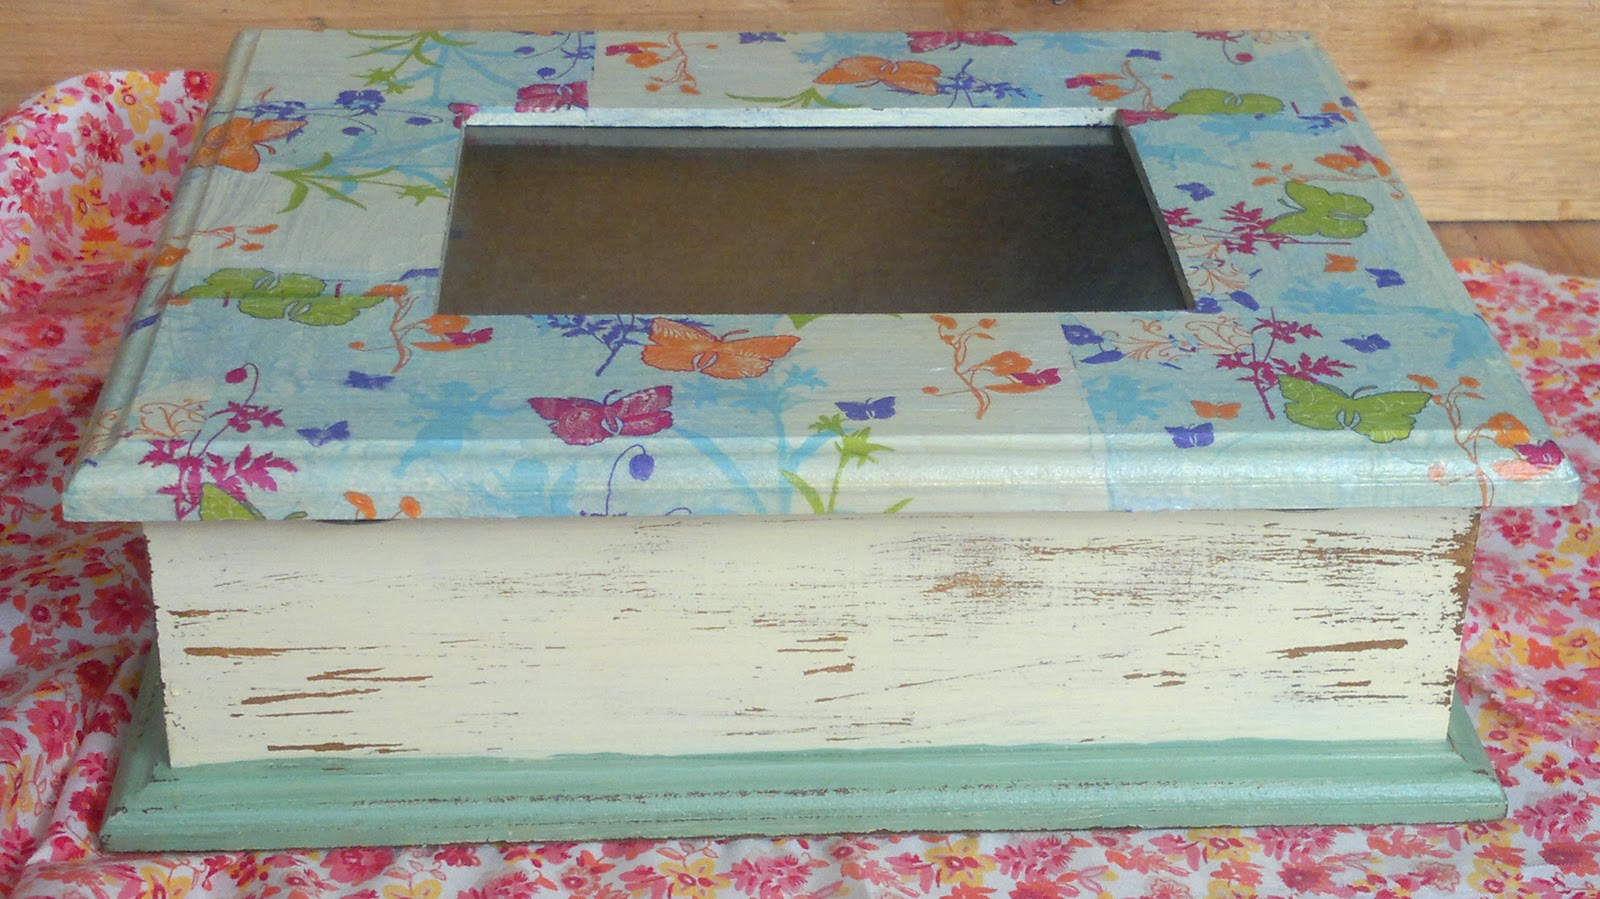 Como pintar una caja de te en decoupage como pintar una - Como hacer una caja para te ...